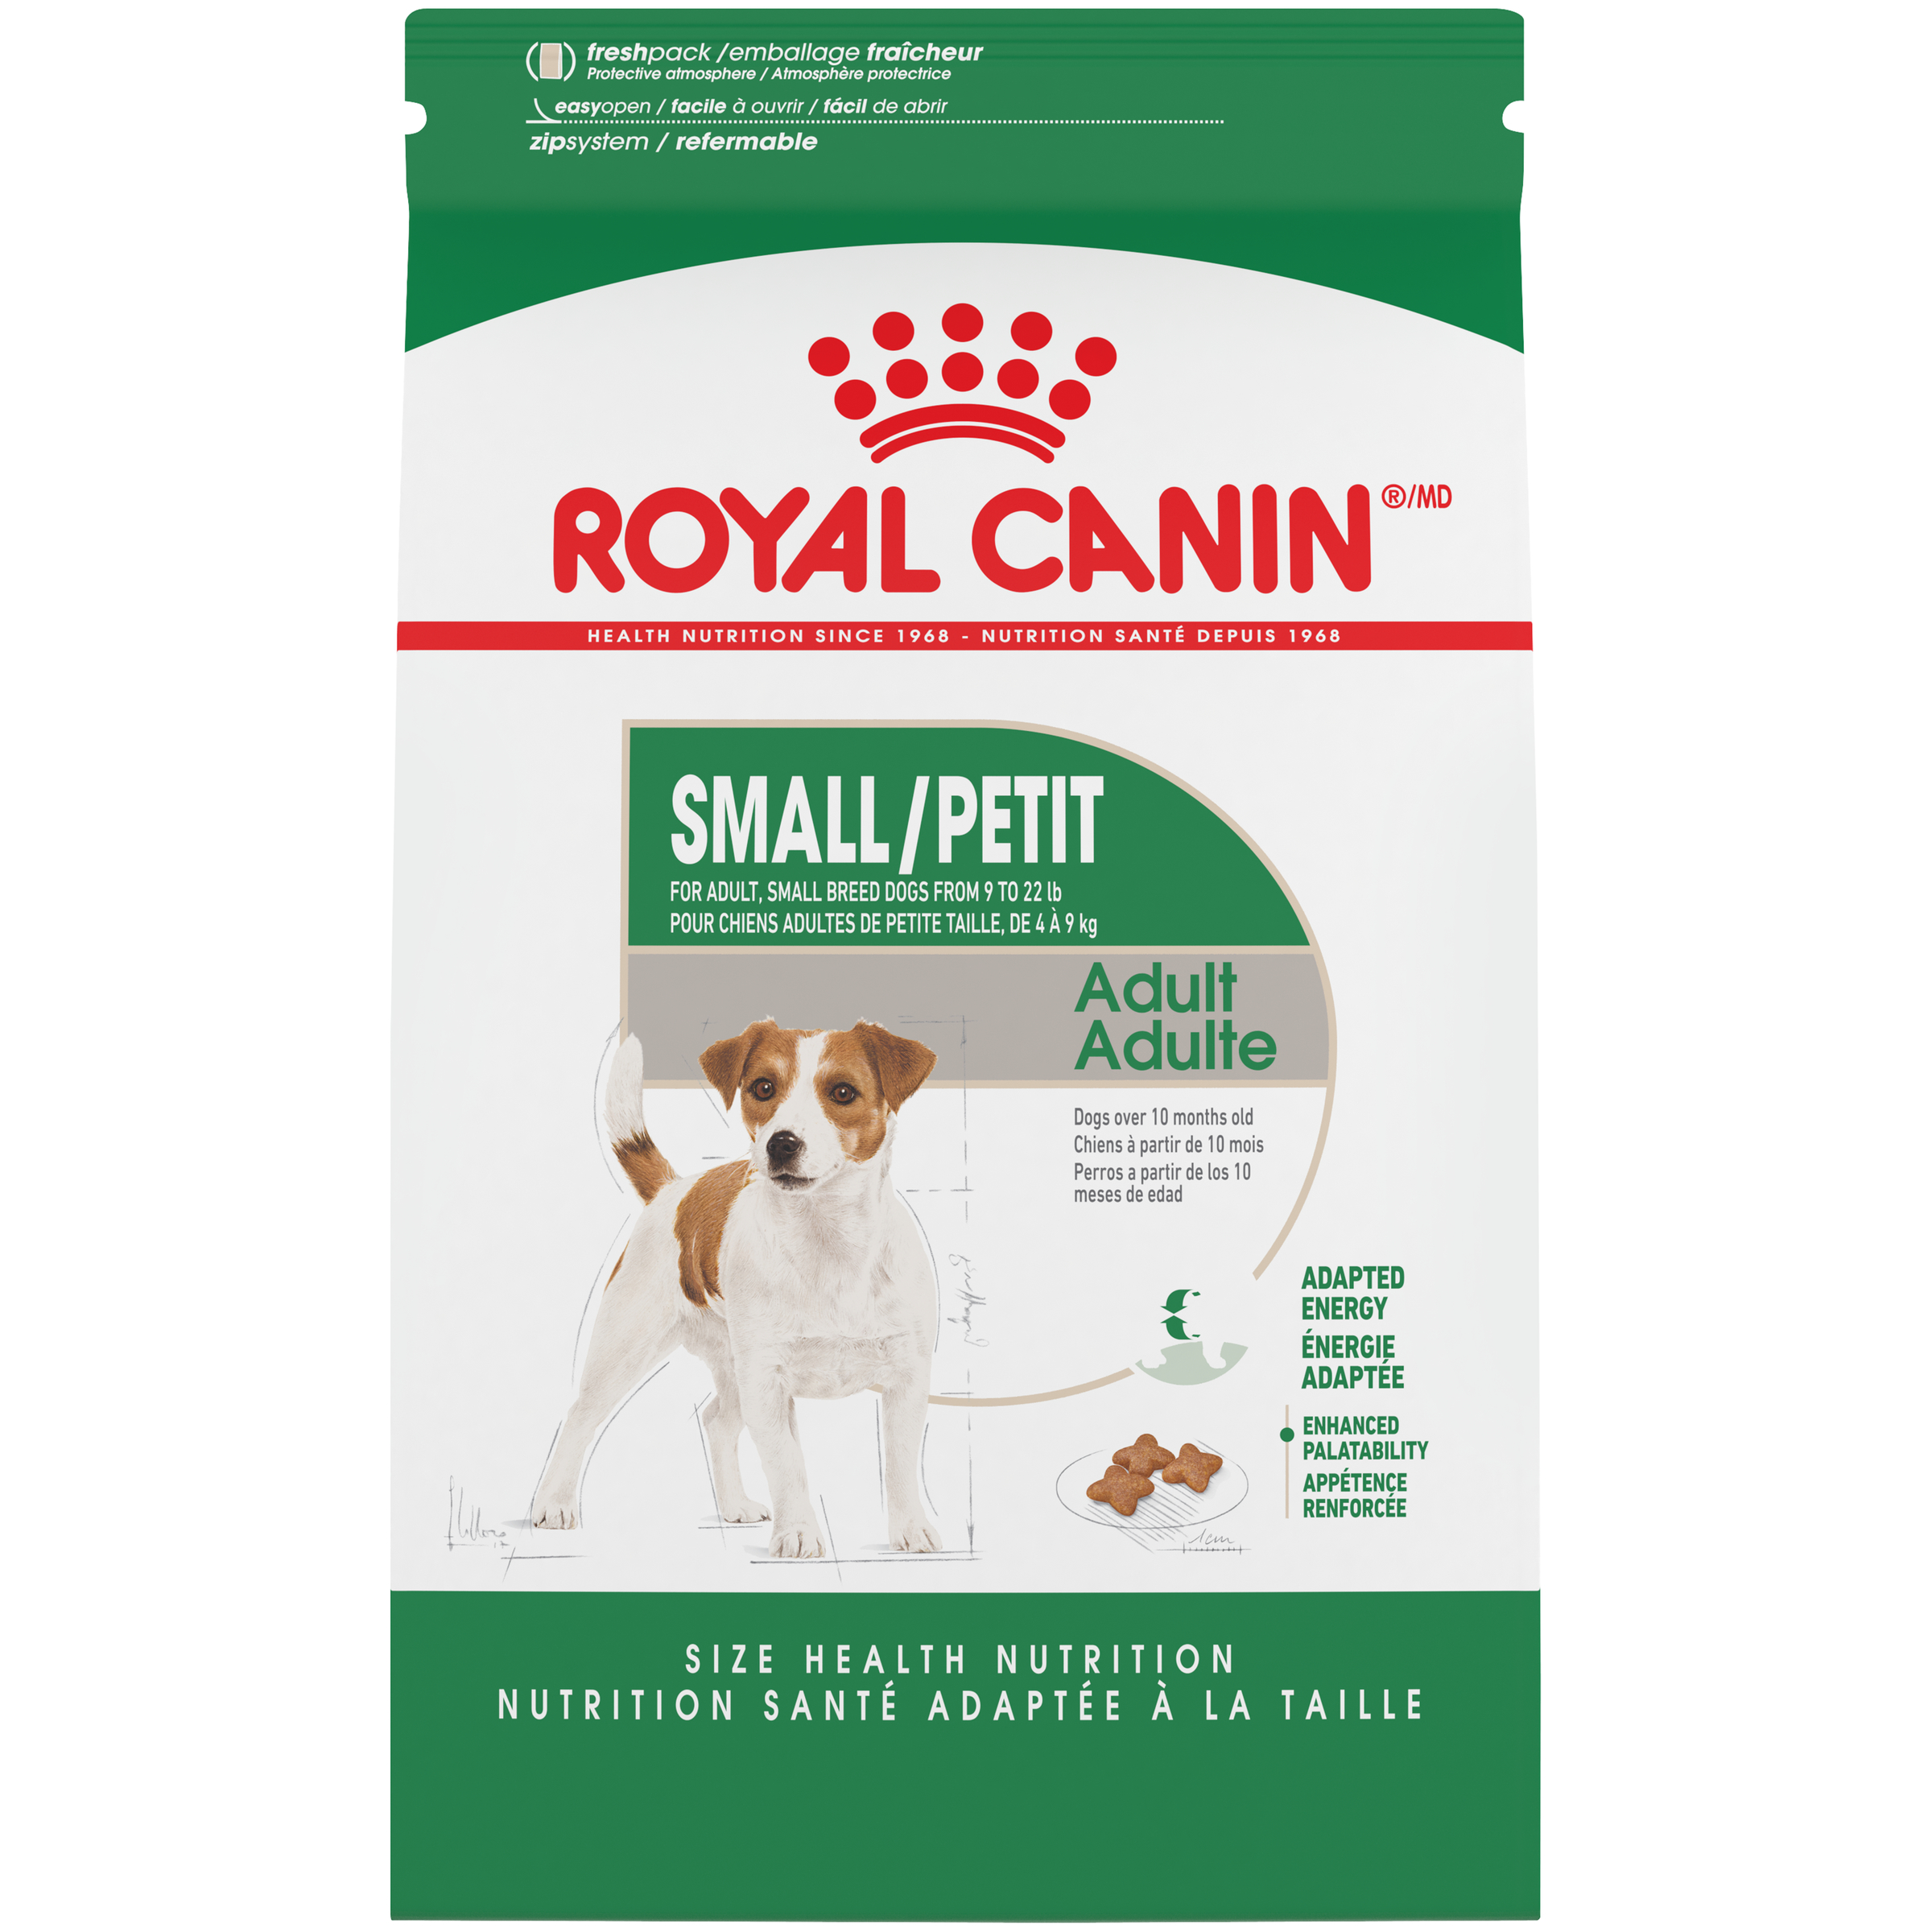 Royal Canin Mini Breed Adult Dry Dog Food, 2.5 lb